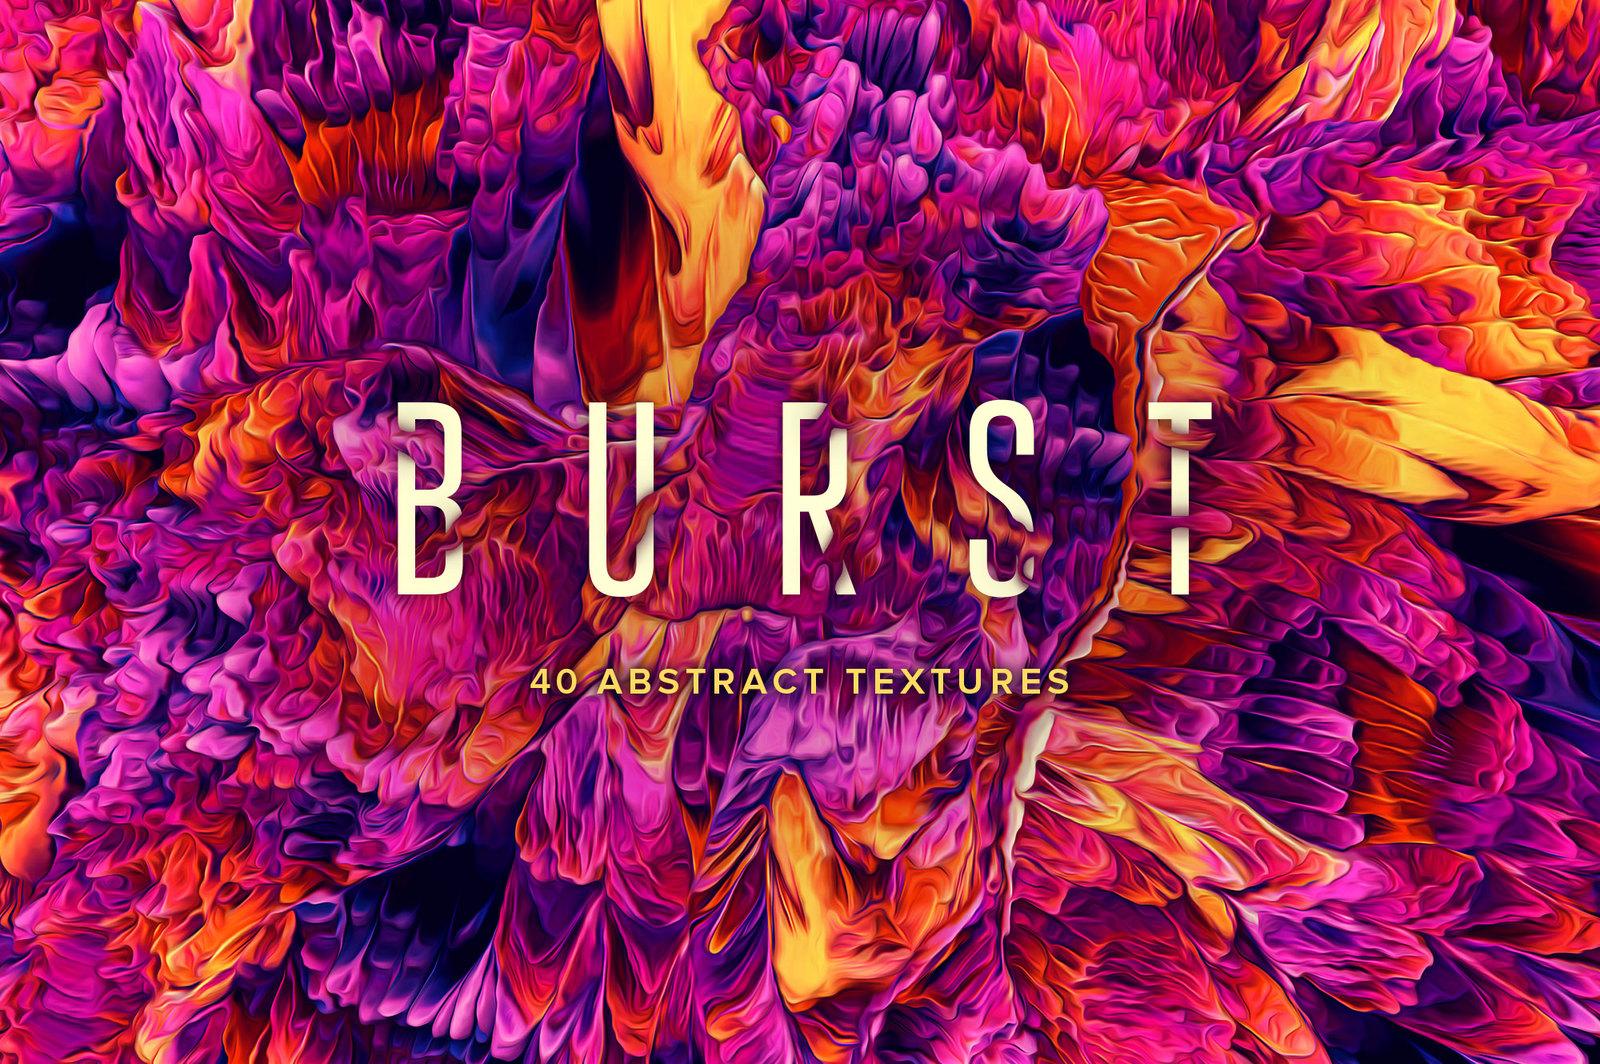 Burst: 40 Abstract Paint Textures